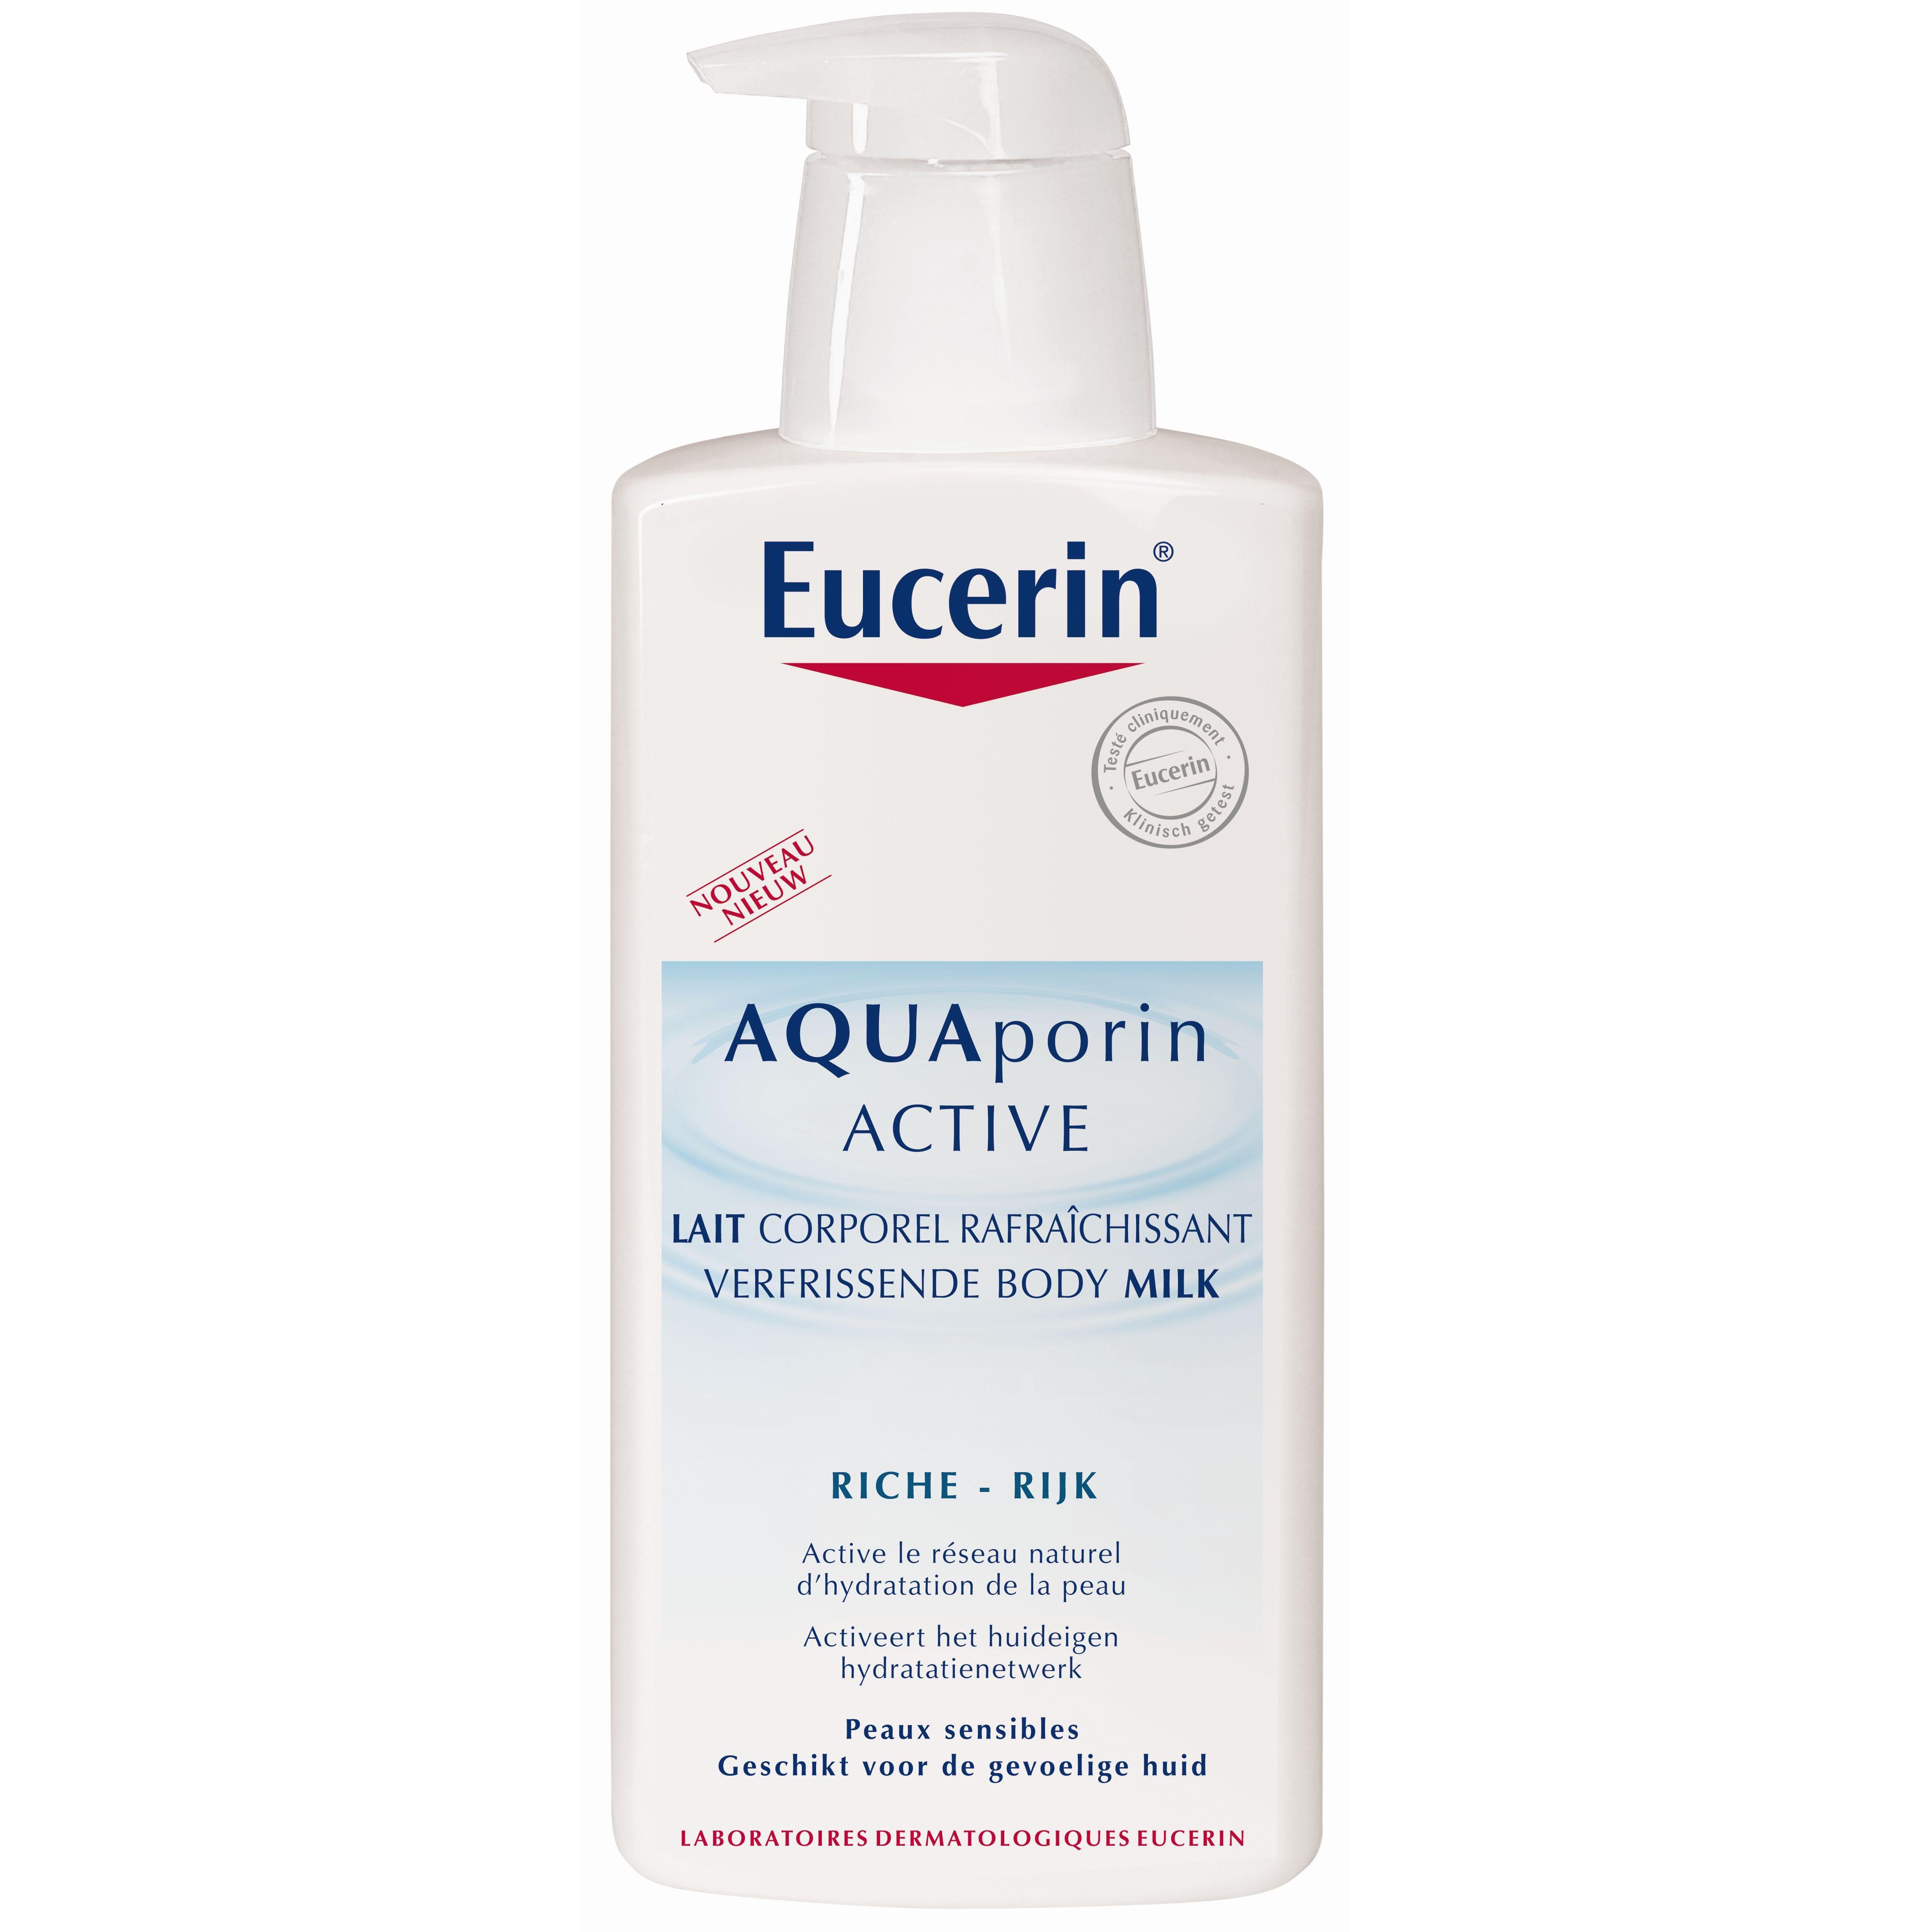 Eucerin Aquaporin Body Rijke Textuur 400ml